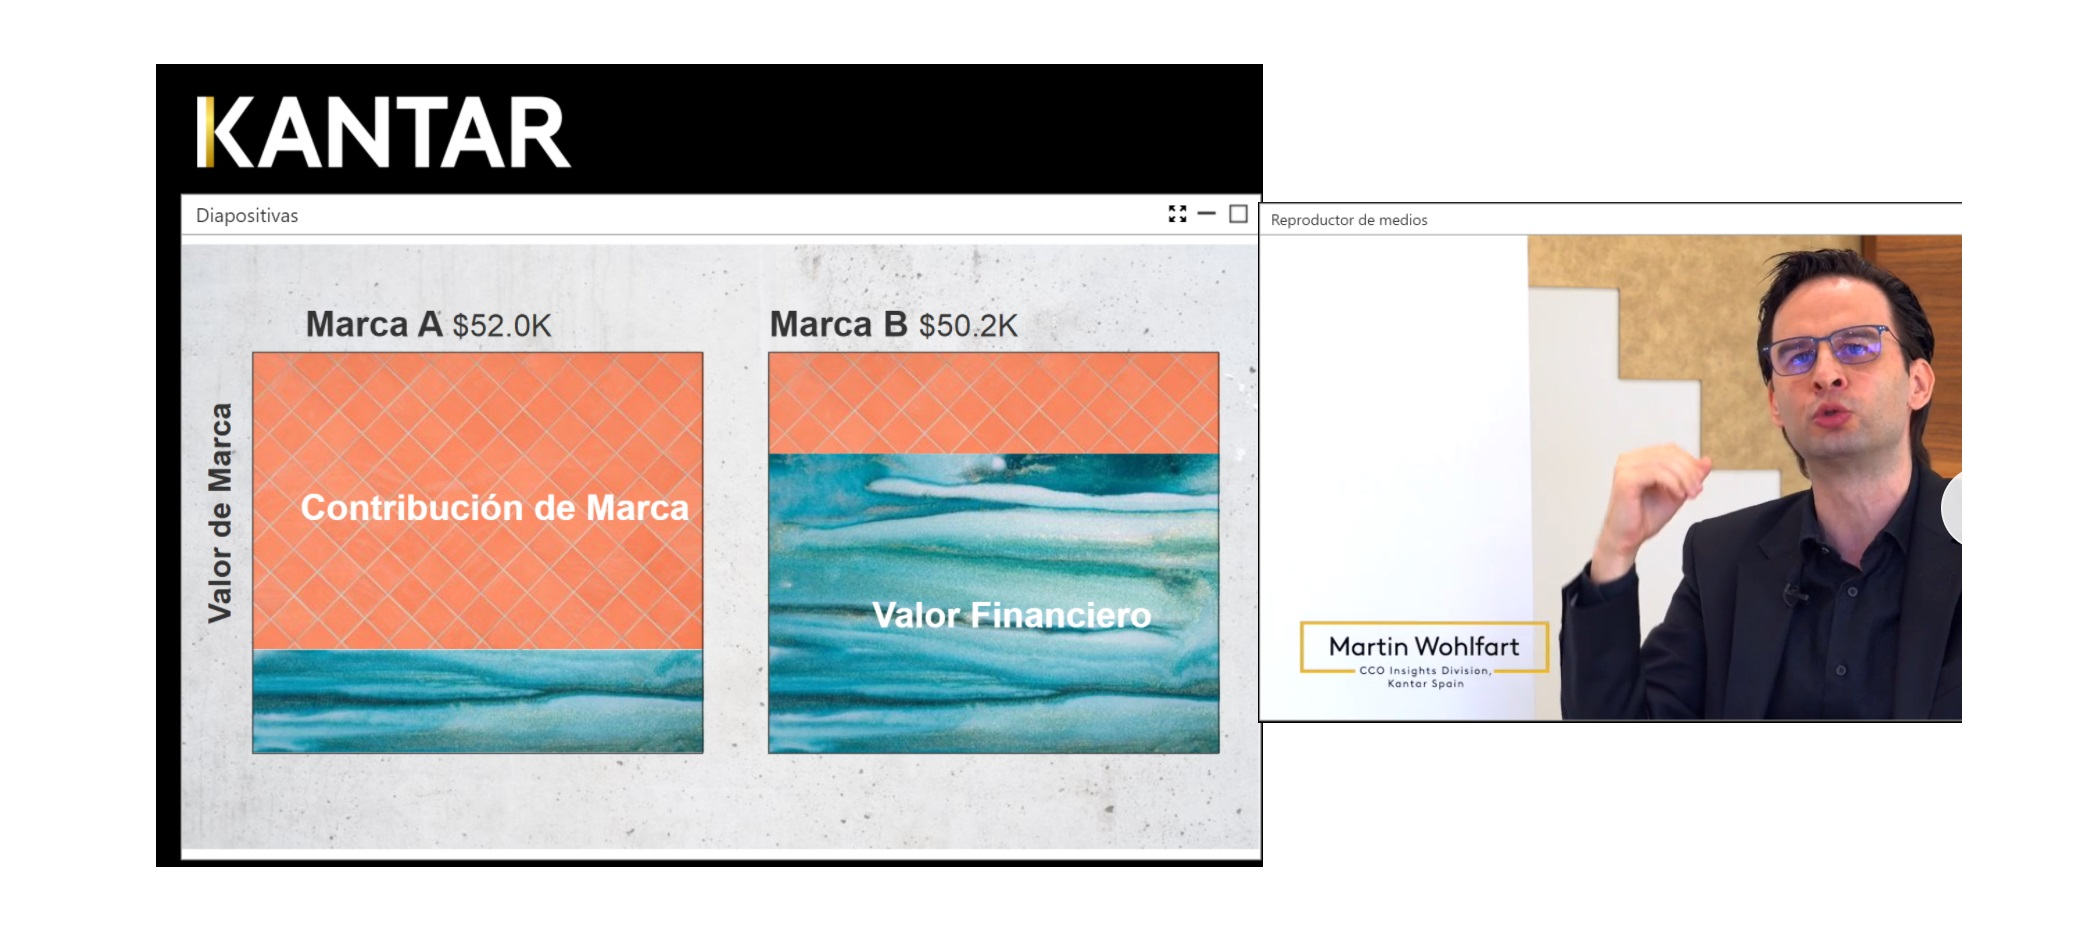 https://www.programapublicidad.com/wp-content/uploads/2020/10/Martín-wohlfart-contribución-marca-chief-comercial-officer-insights-Kantar-Spain-programapublicidad.jpg